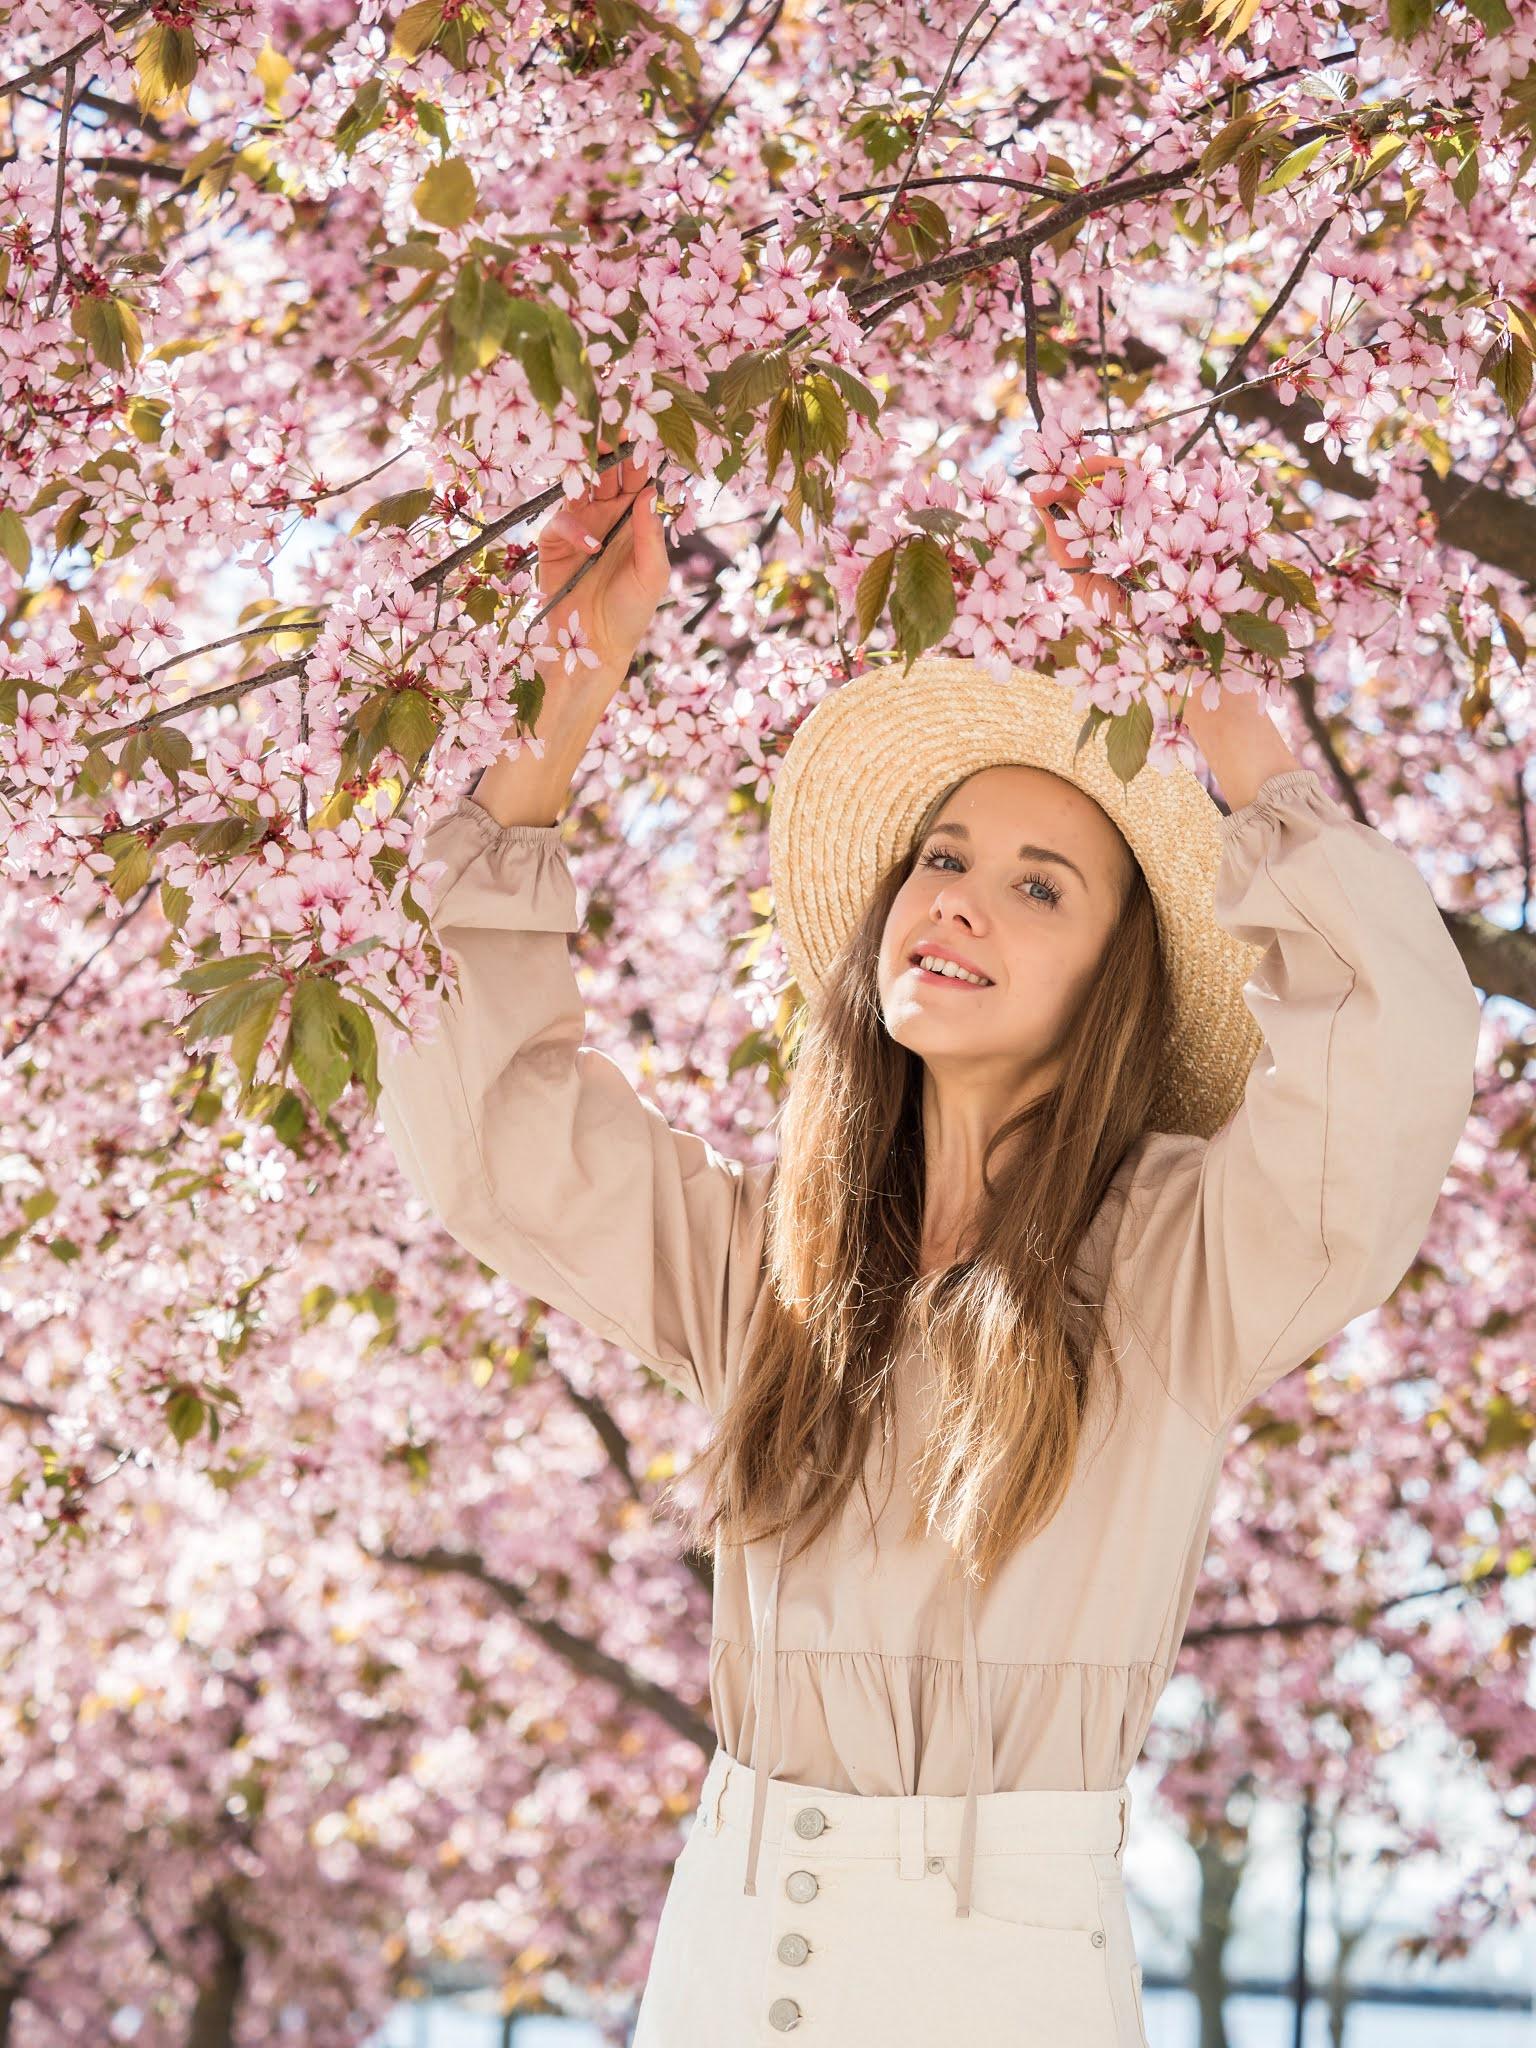 Kirsikankukat Helsinki, muotibloggaaja // Cherry blossoms in Helsinki, fashion blogger